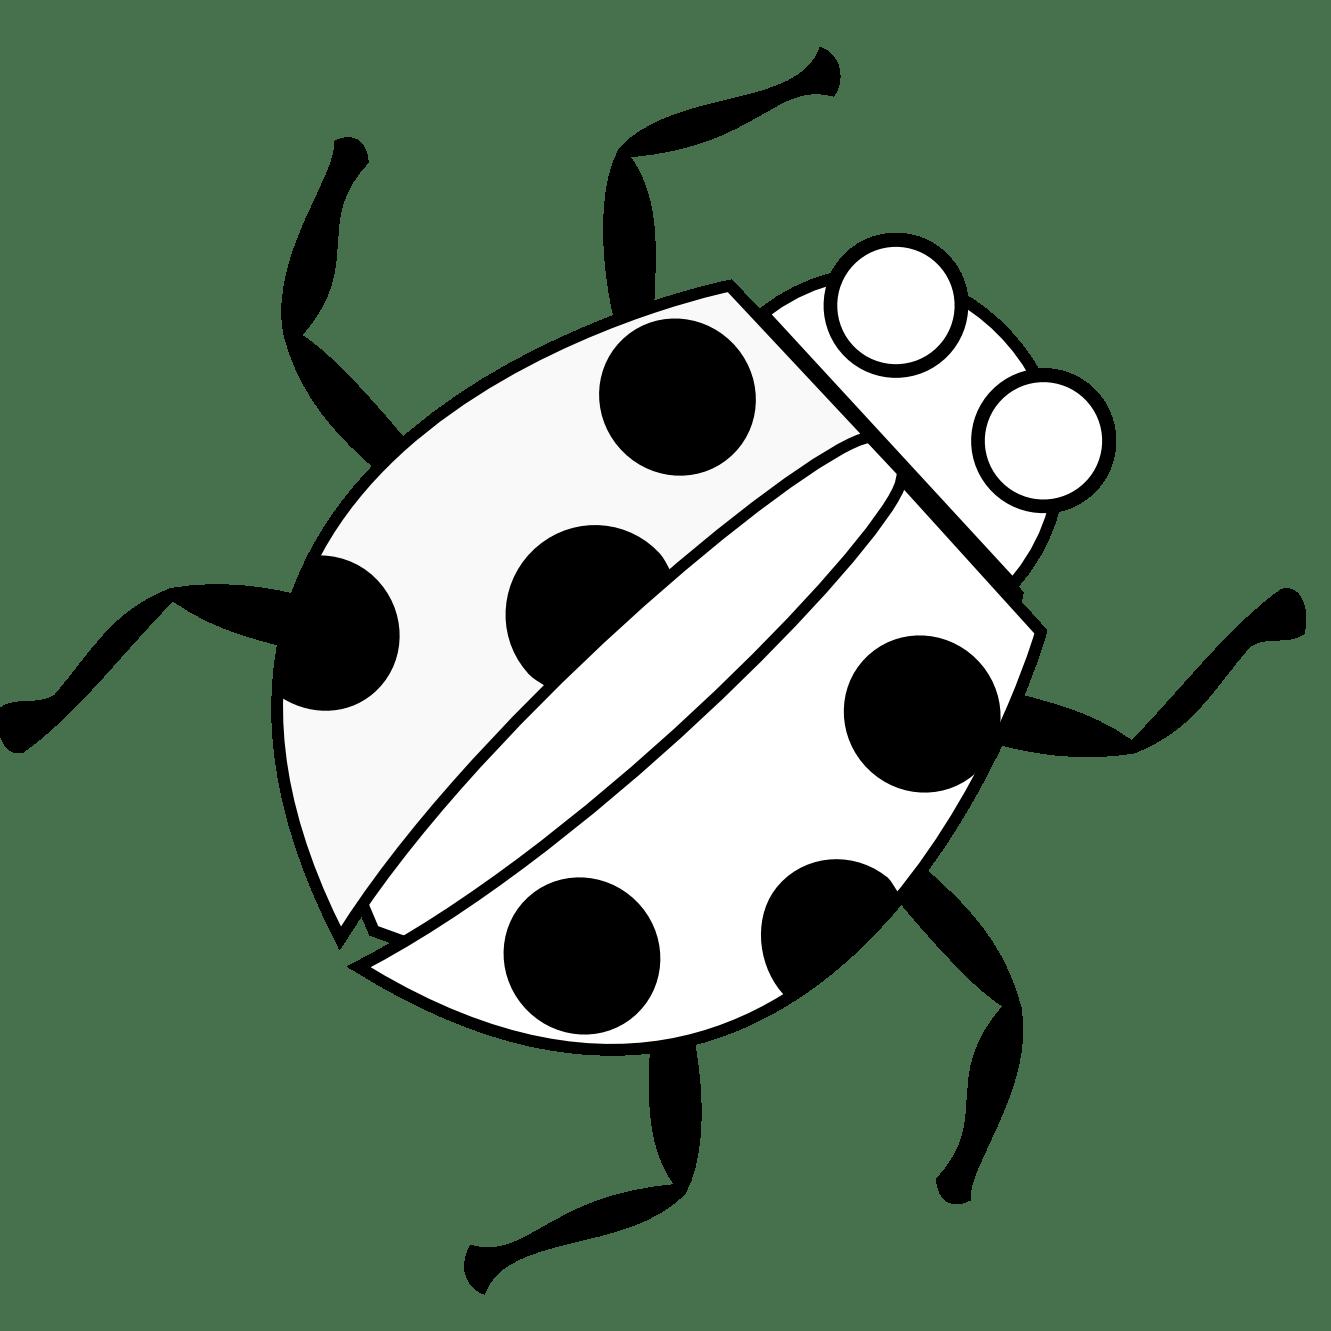 Ladybug 3 Black White Line Art Flower Scalable Vector